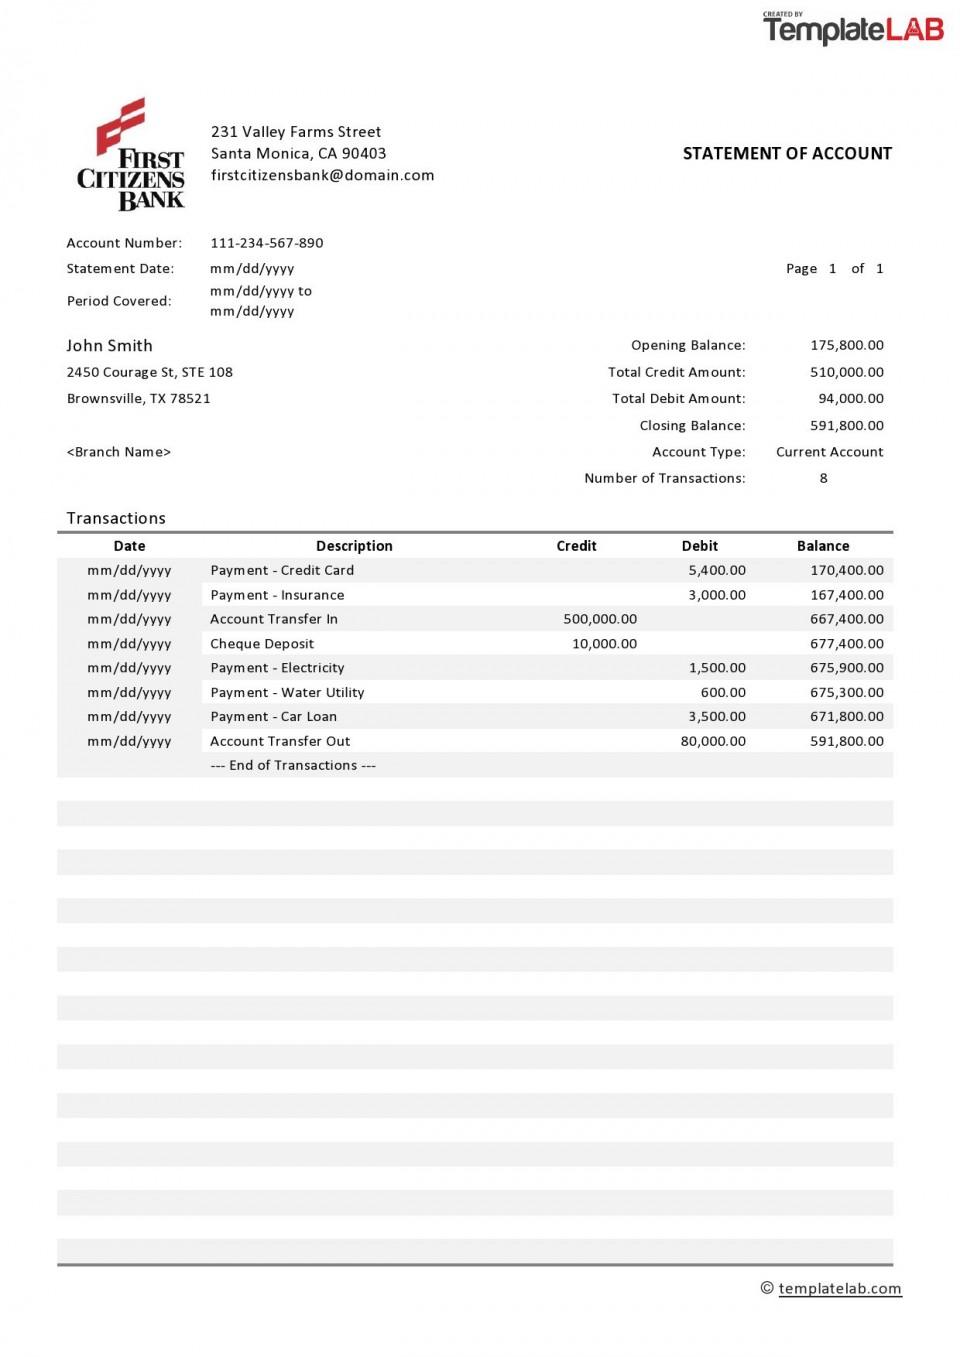 004 Surprising Statement Of Account Template Design  Uk Free Doc Customer960